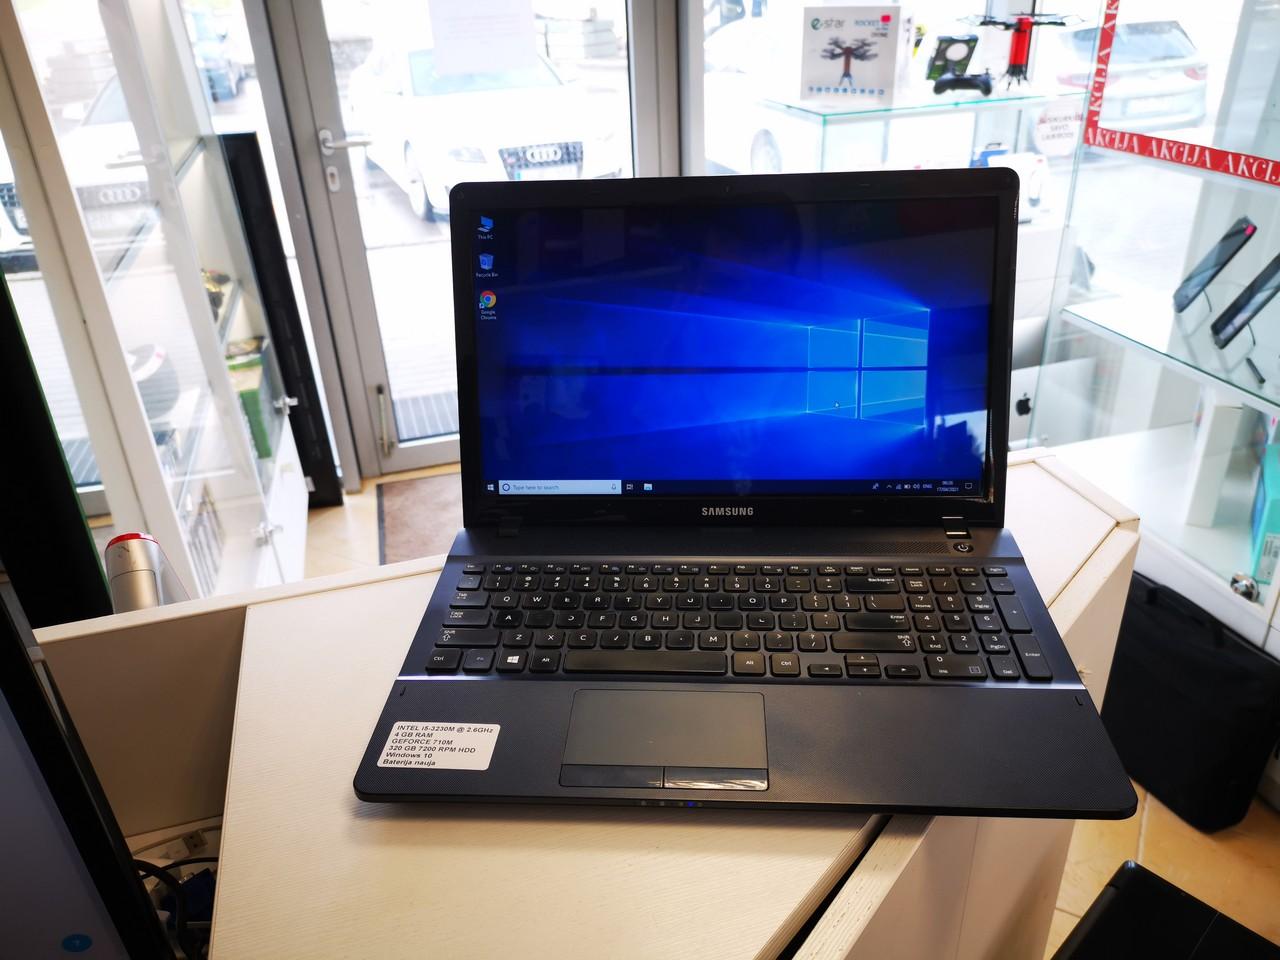 картинка Samsung laptopas žaidimams от магазина Одежда+